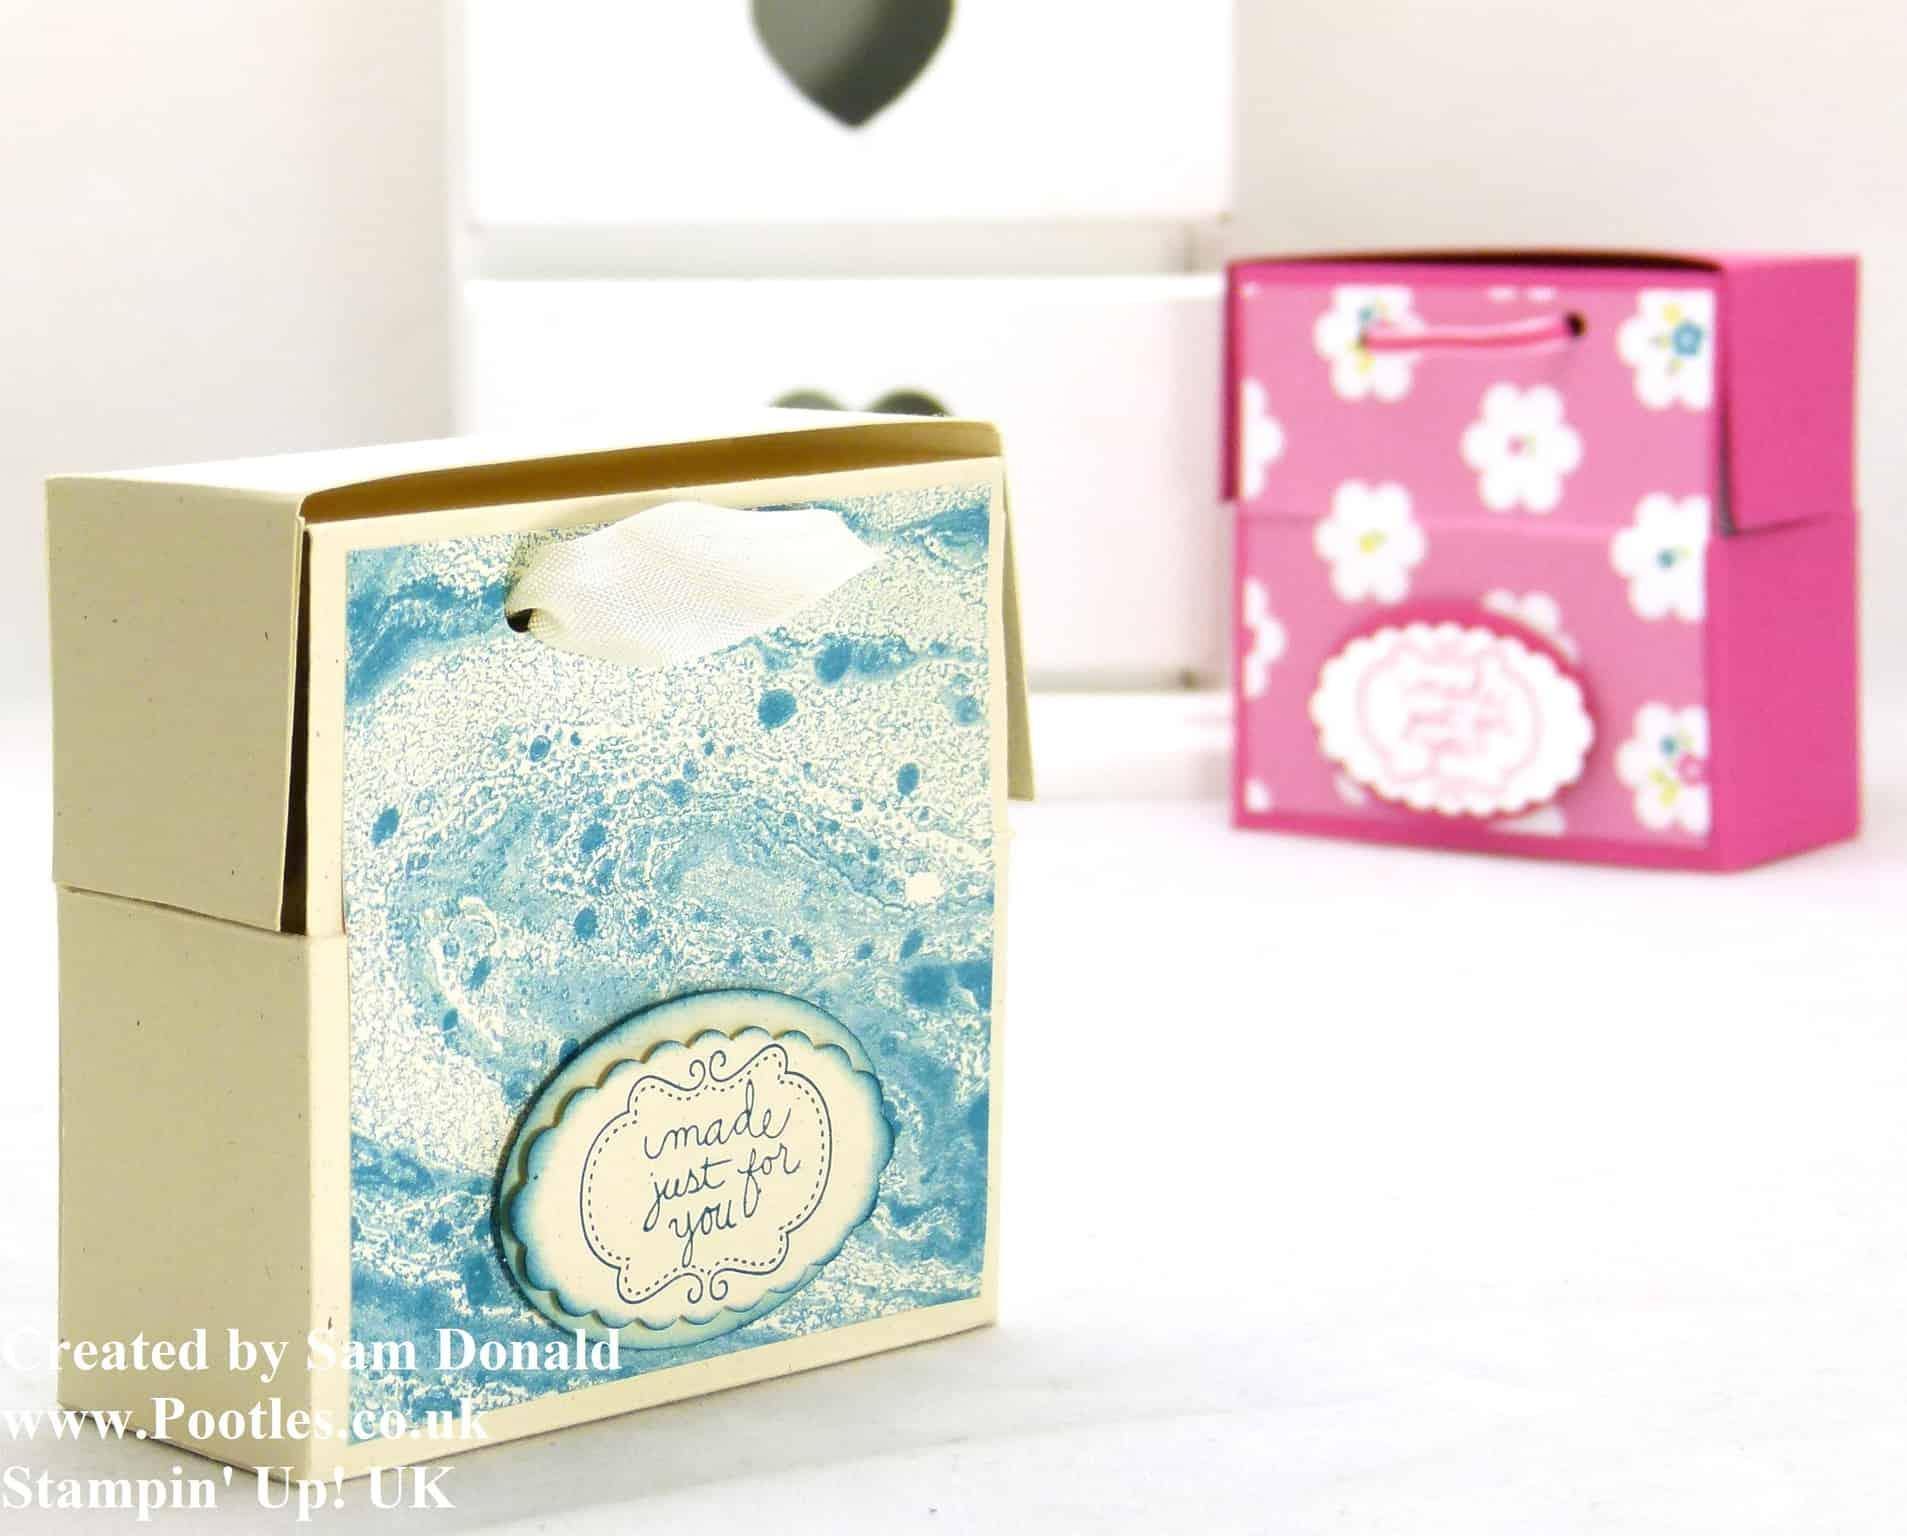 Pootles Stampin Up UK Soap and Card Box Tutorial (2)